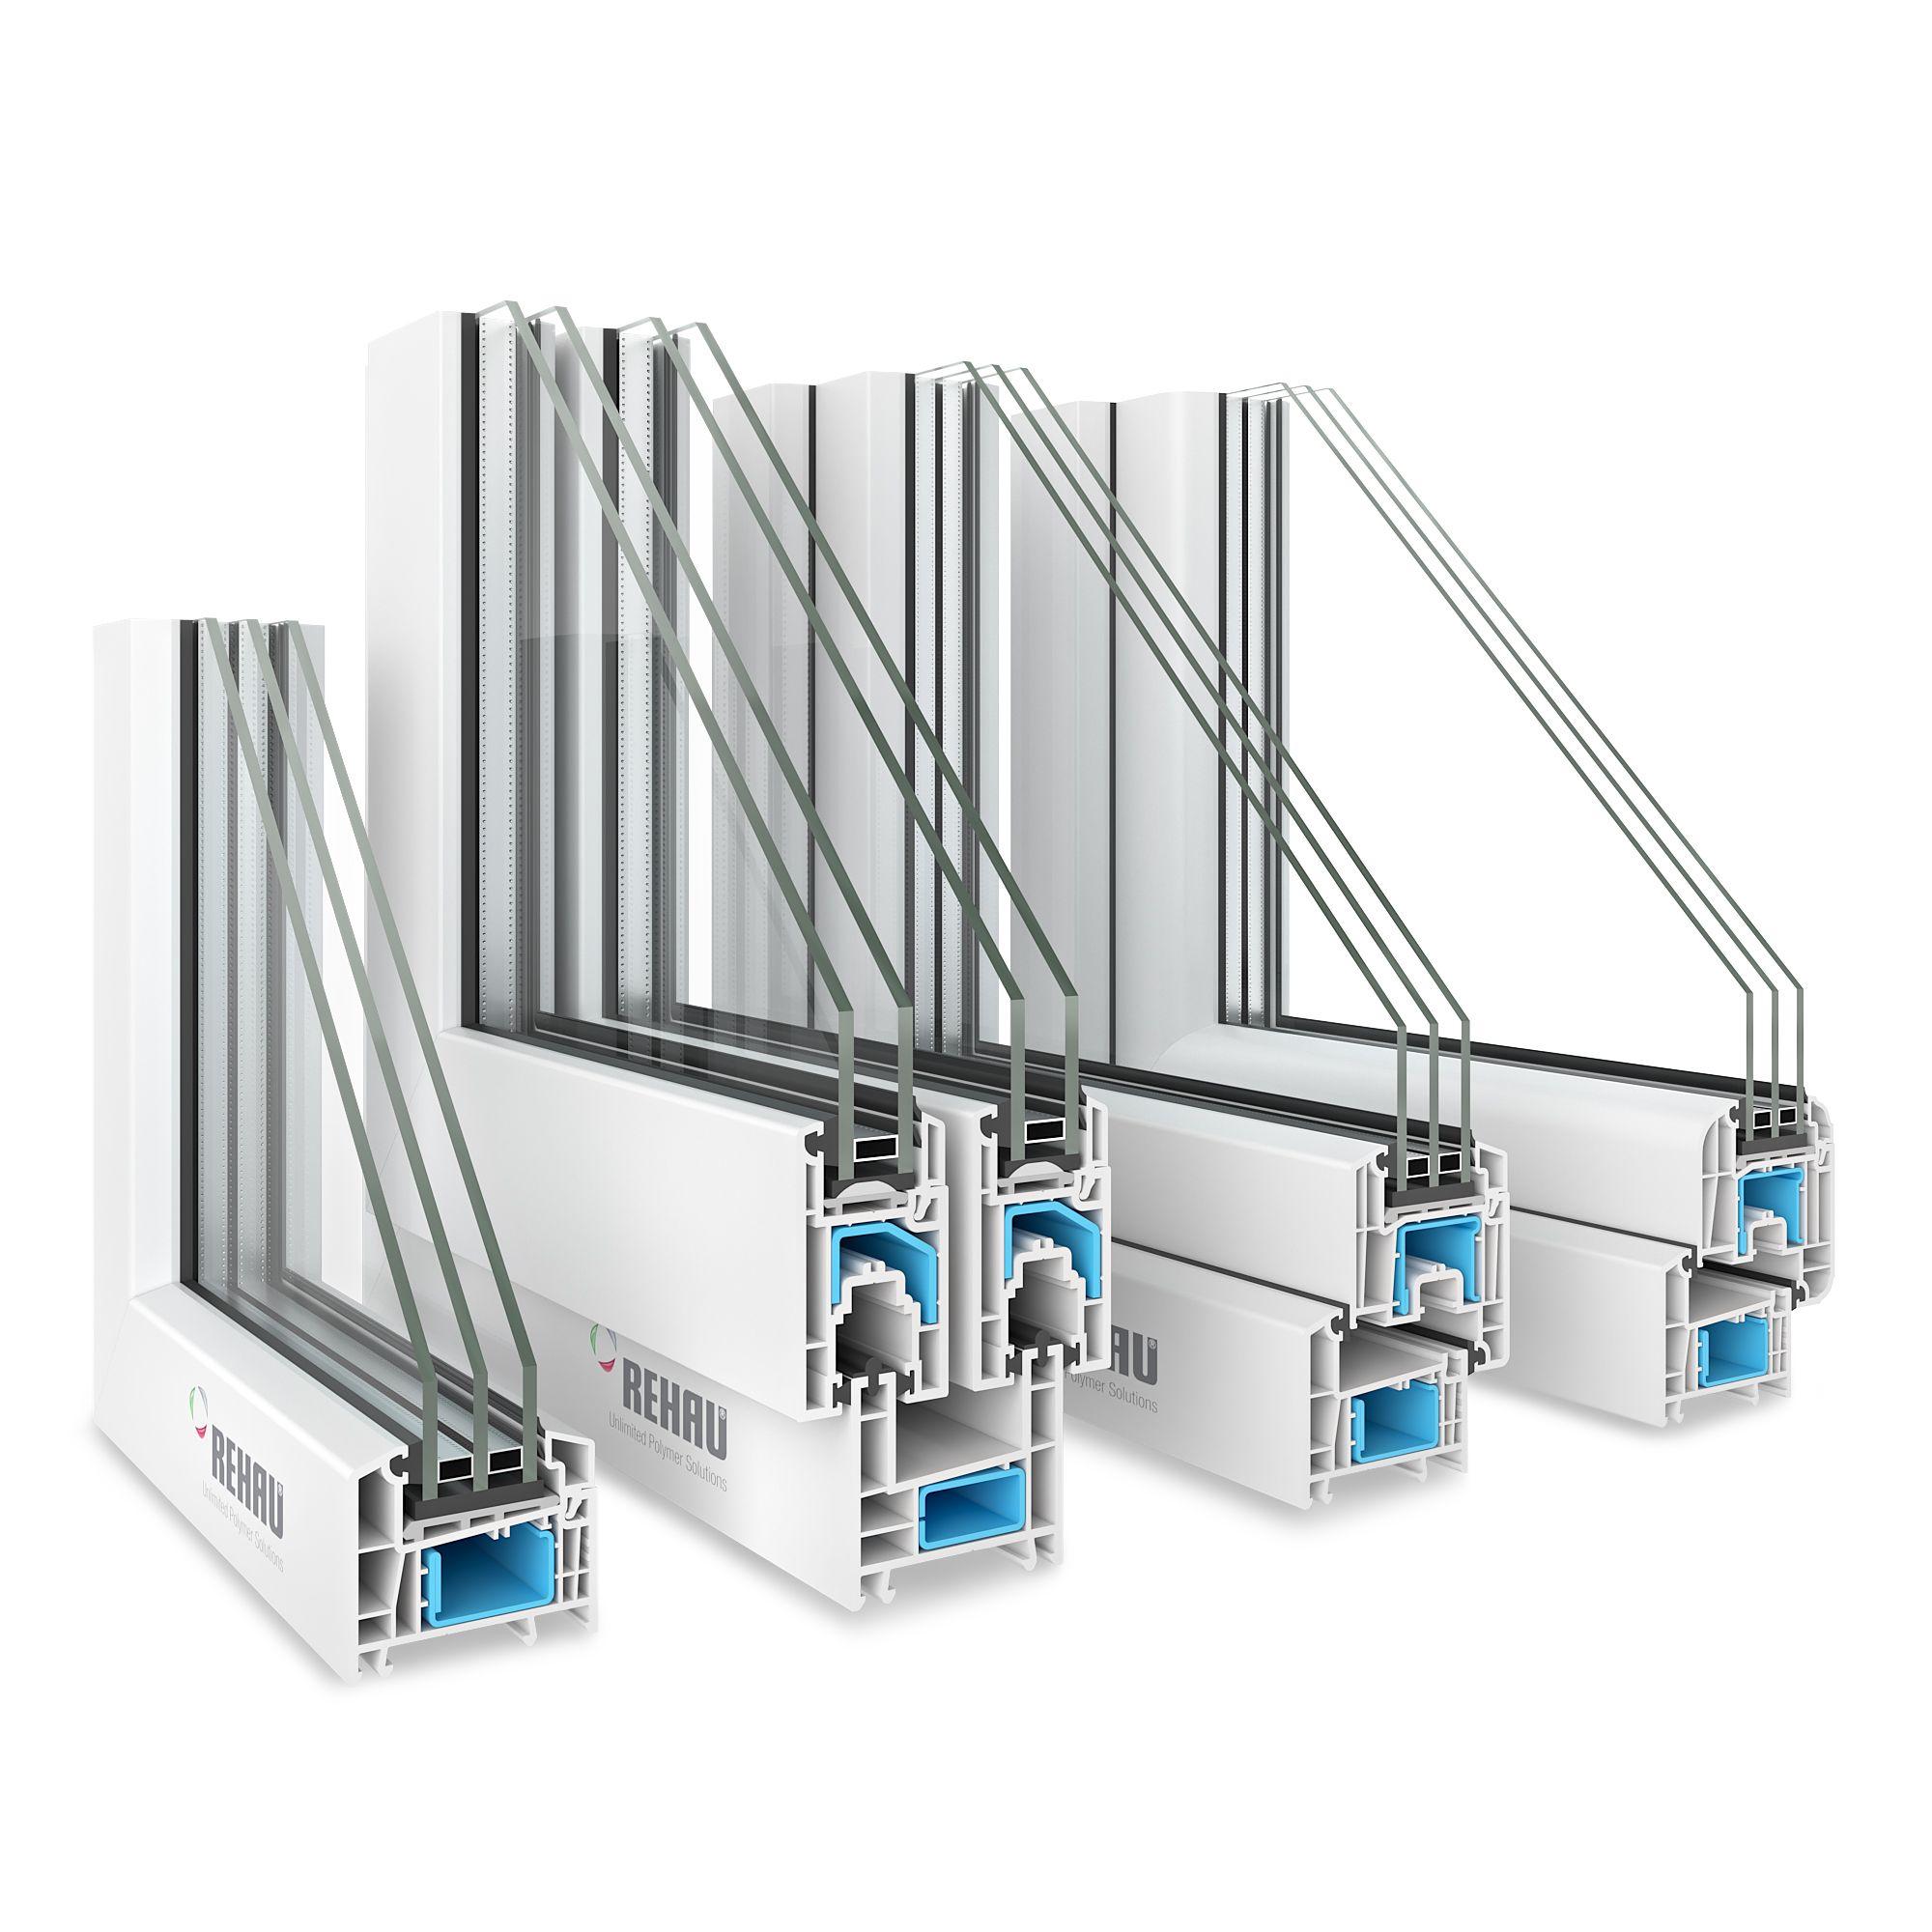 4 Rehau Window Profiles Rehau Windows House 3d Model